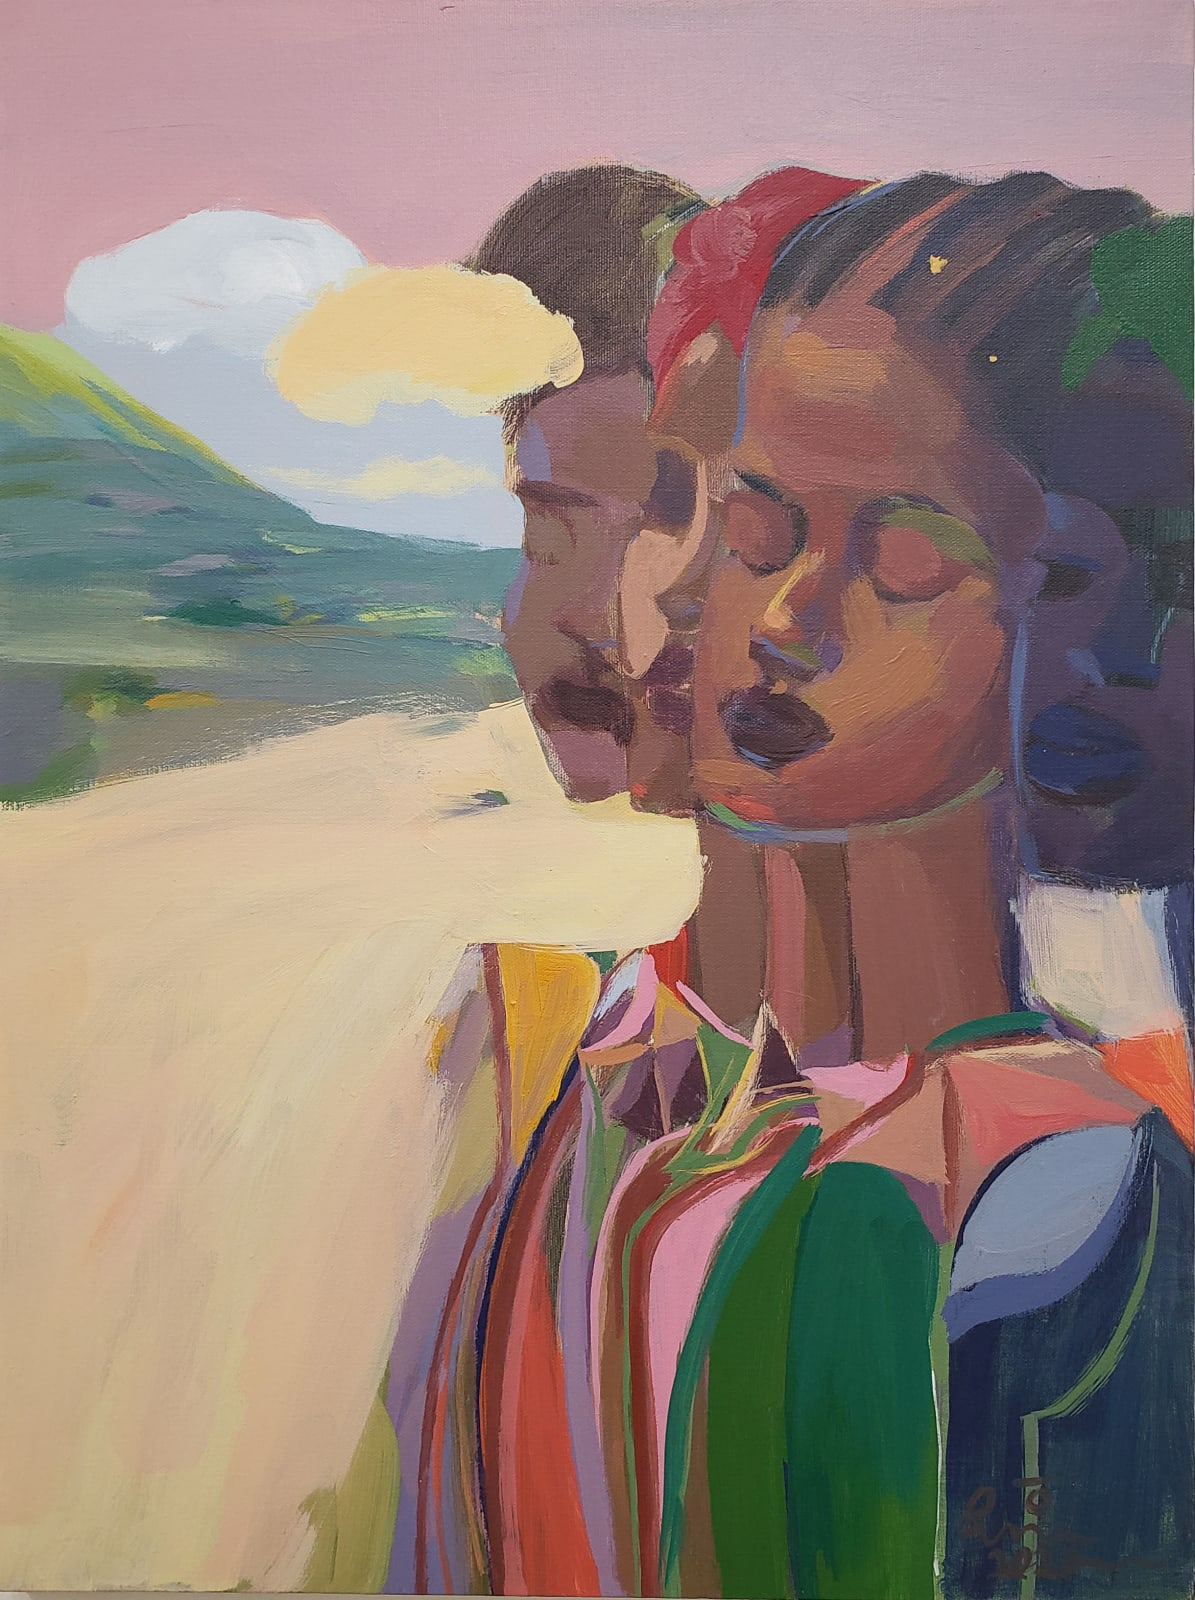 Dereje Demissie, Floating Memories 3, 2020